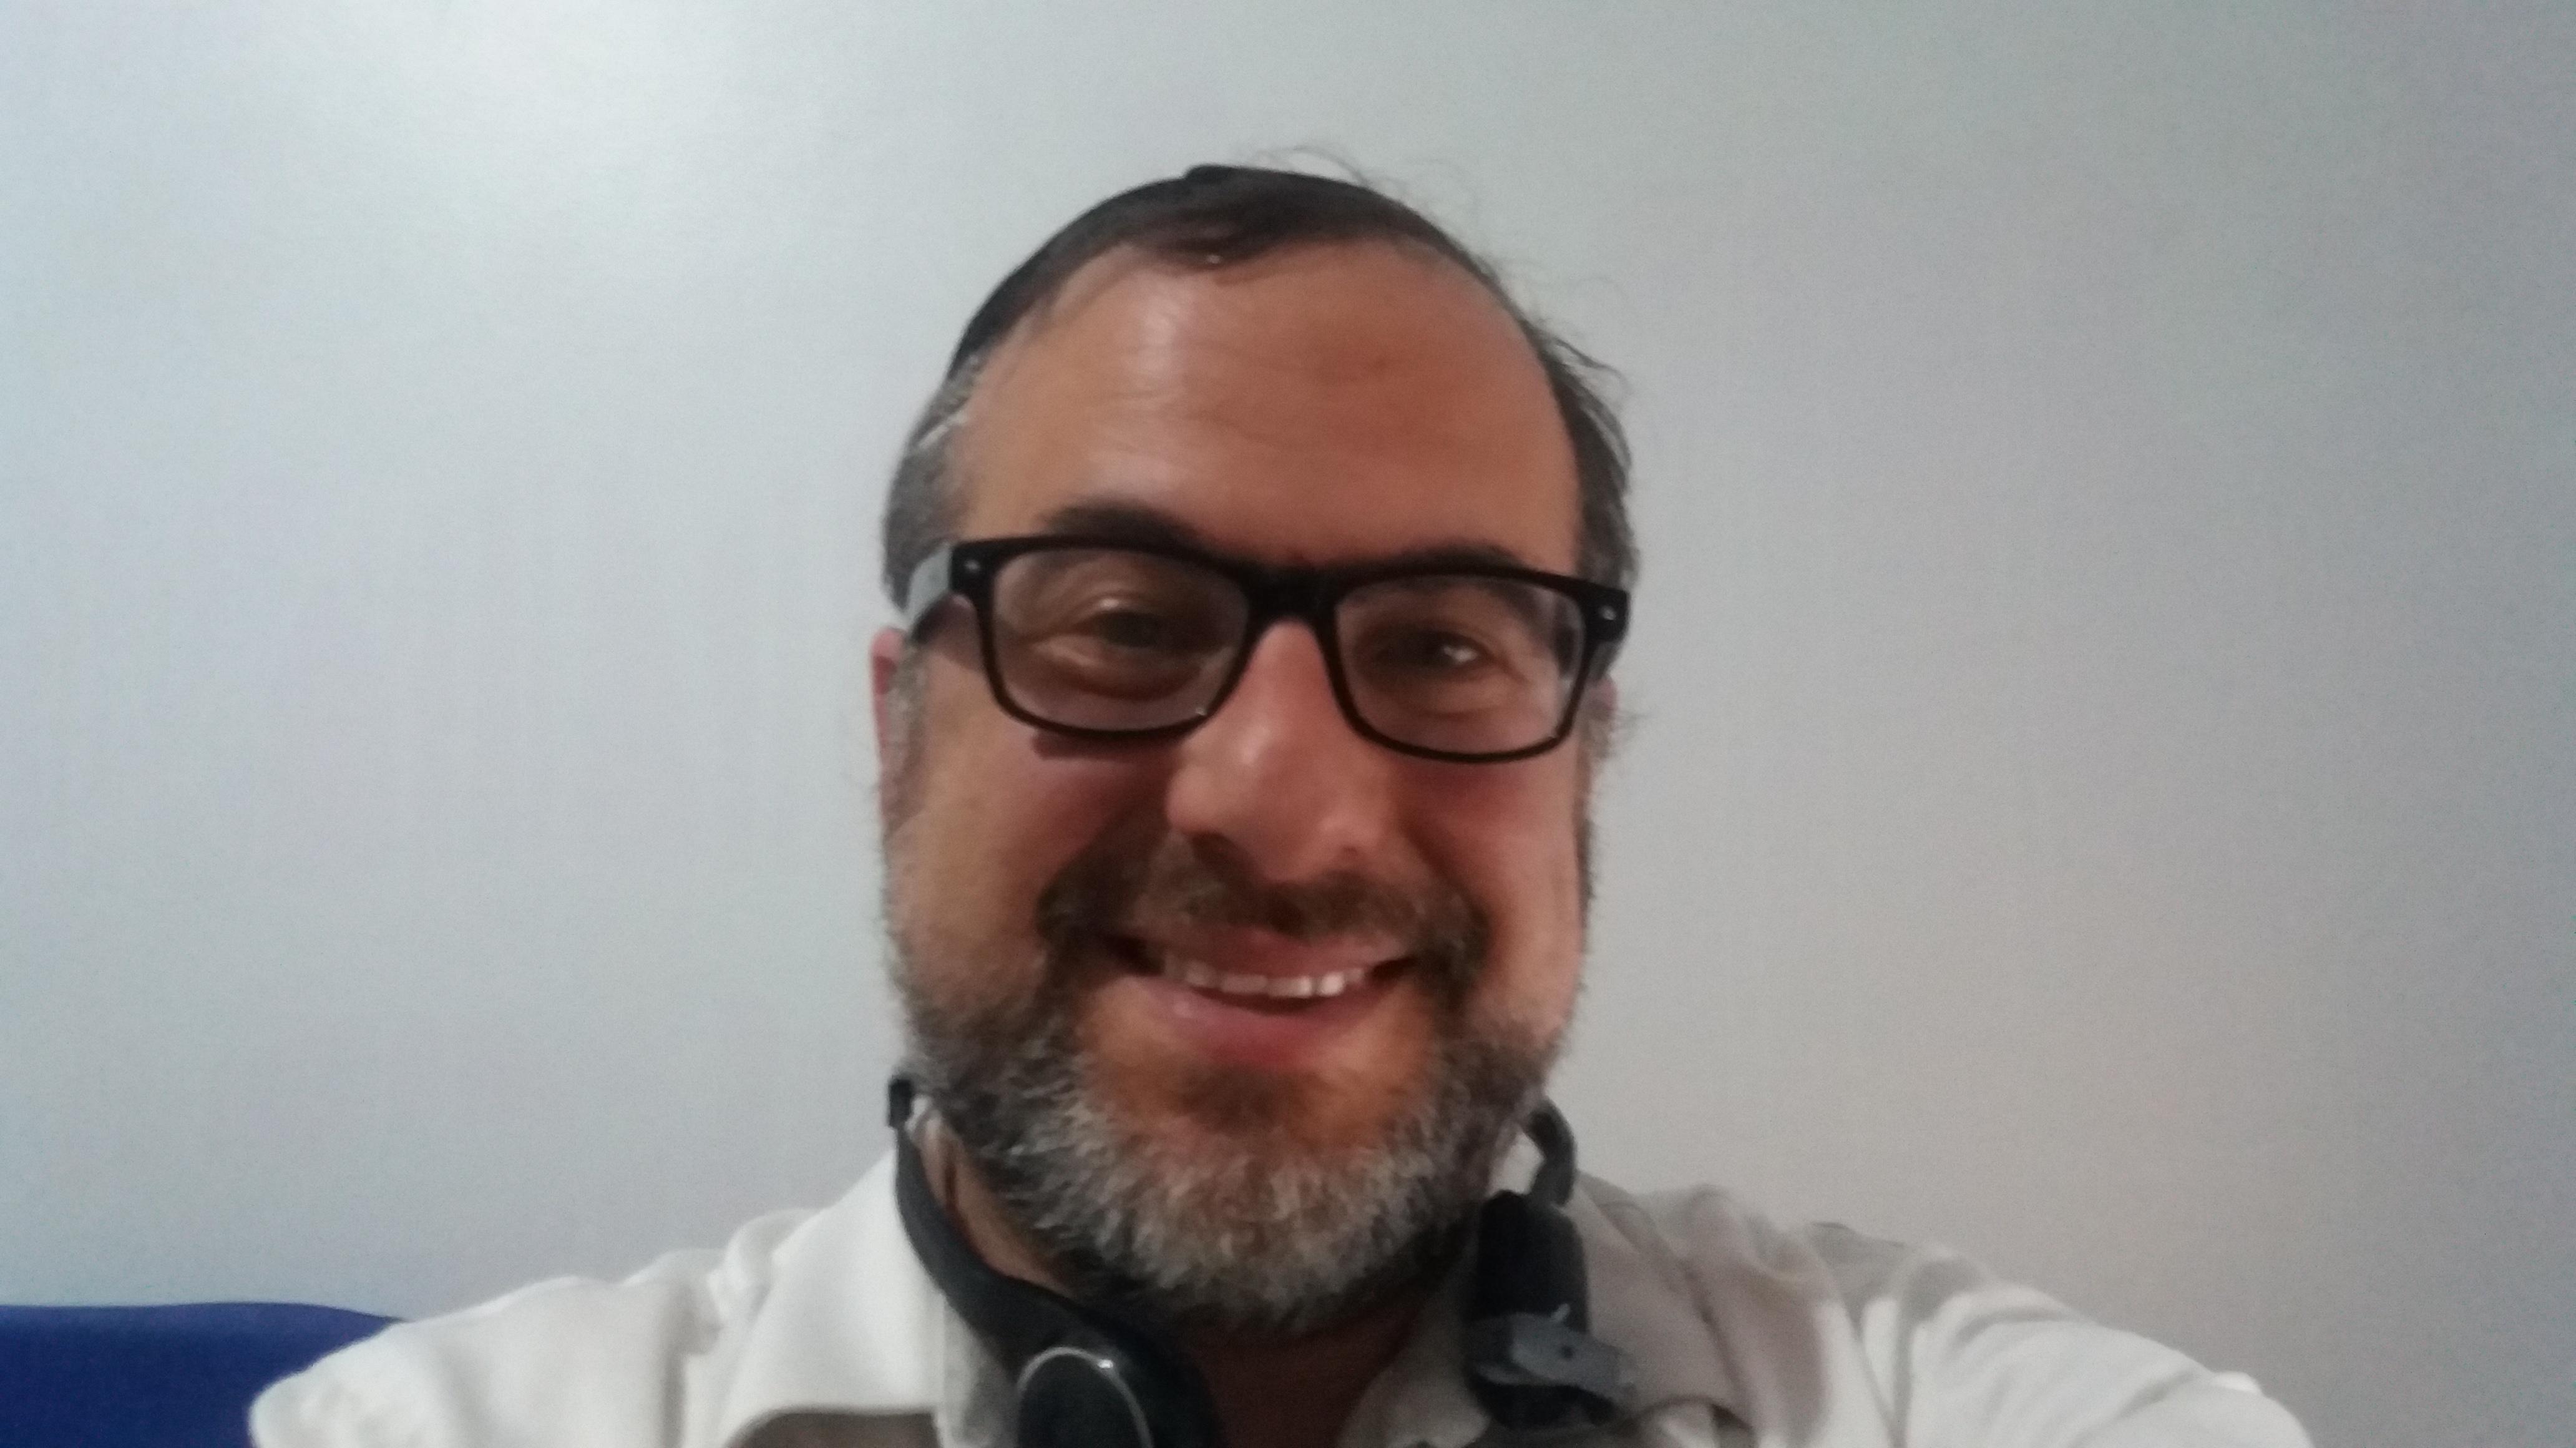 Yehuda David Kars4Kids representative in customer service and sales